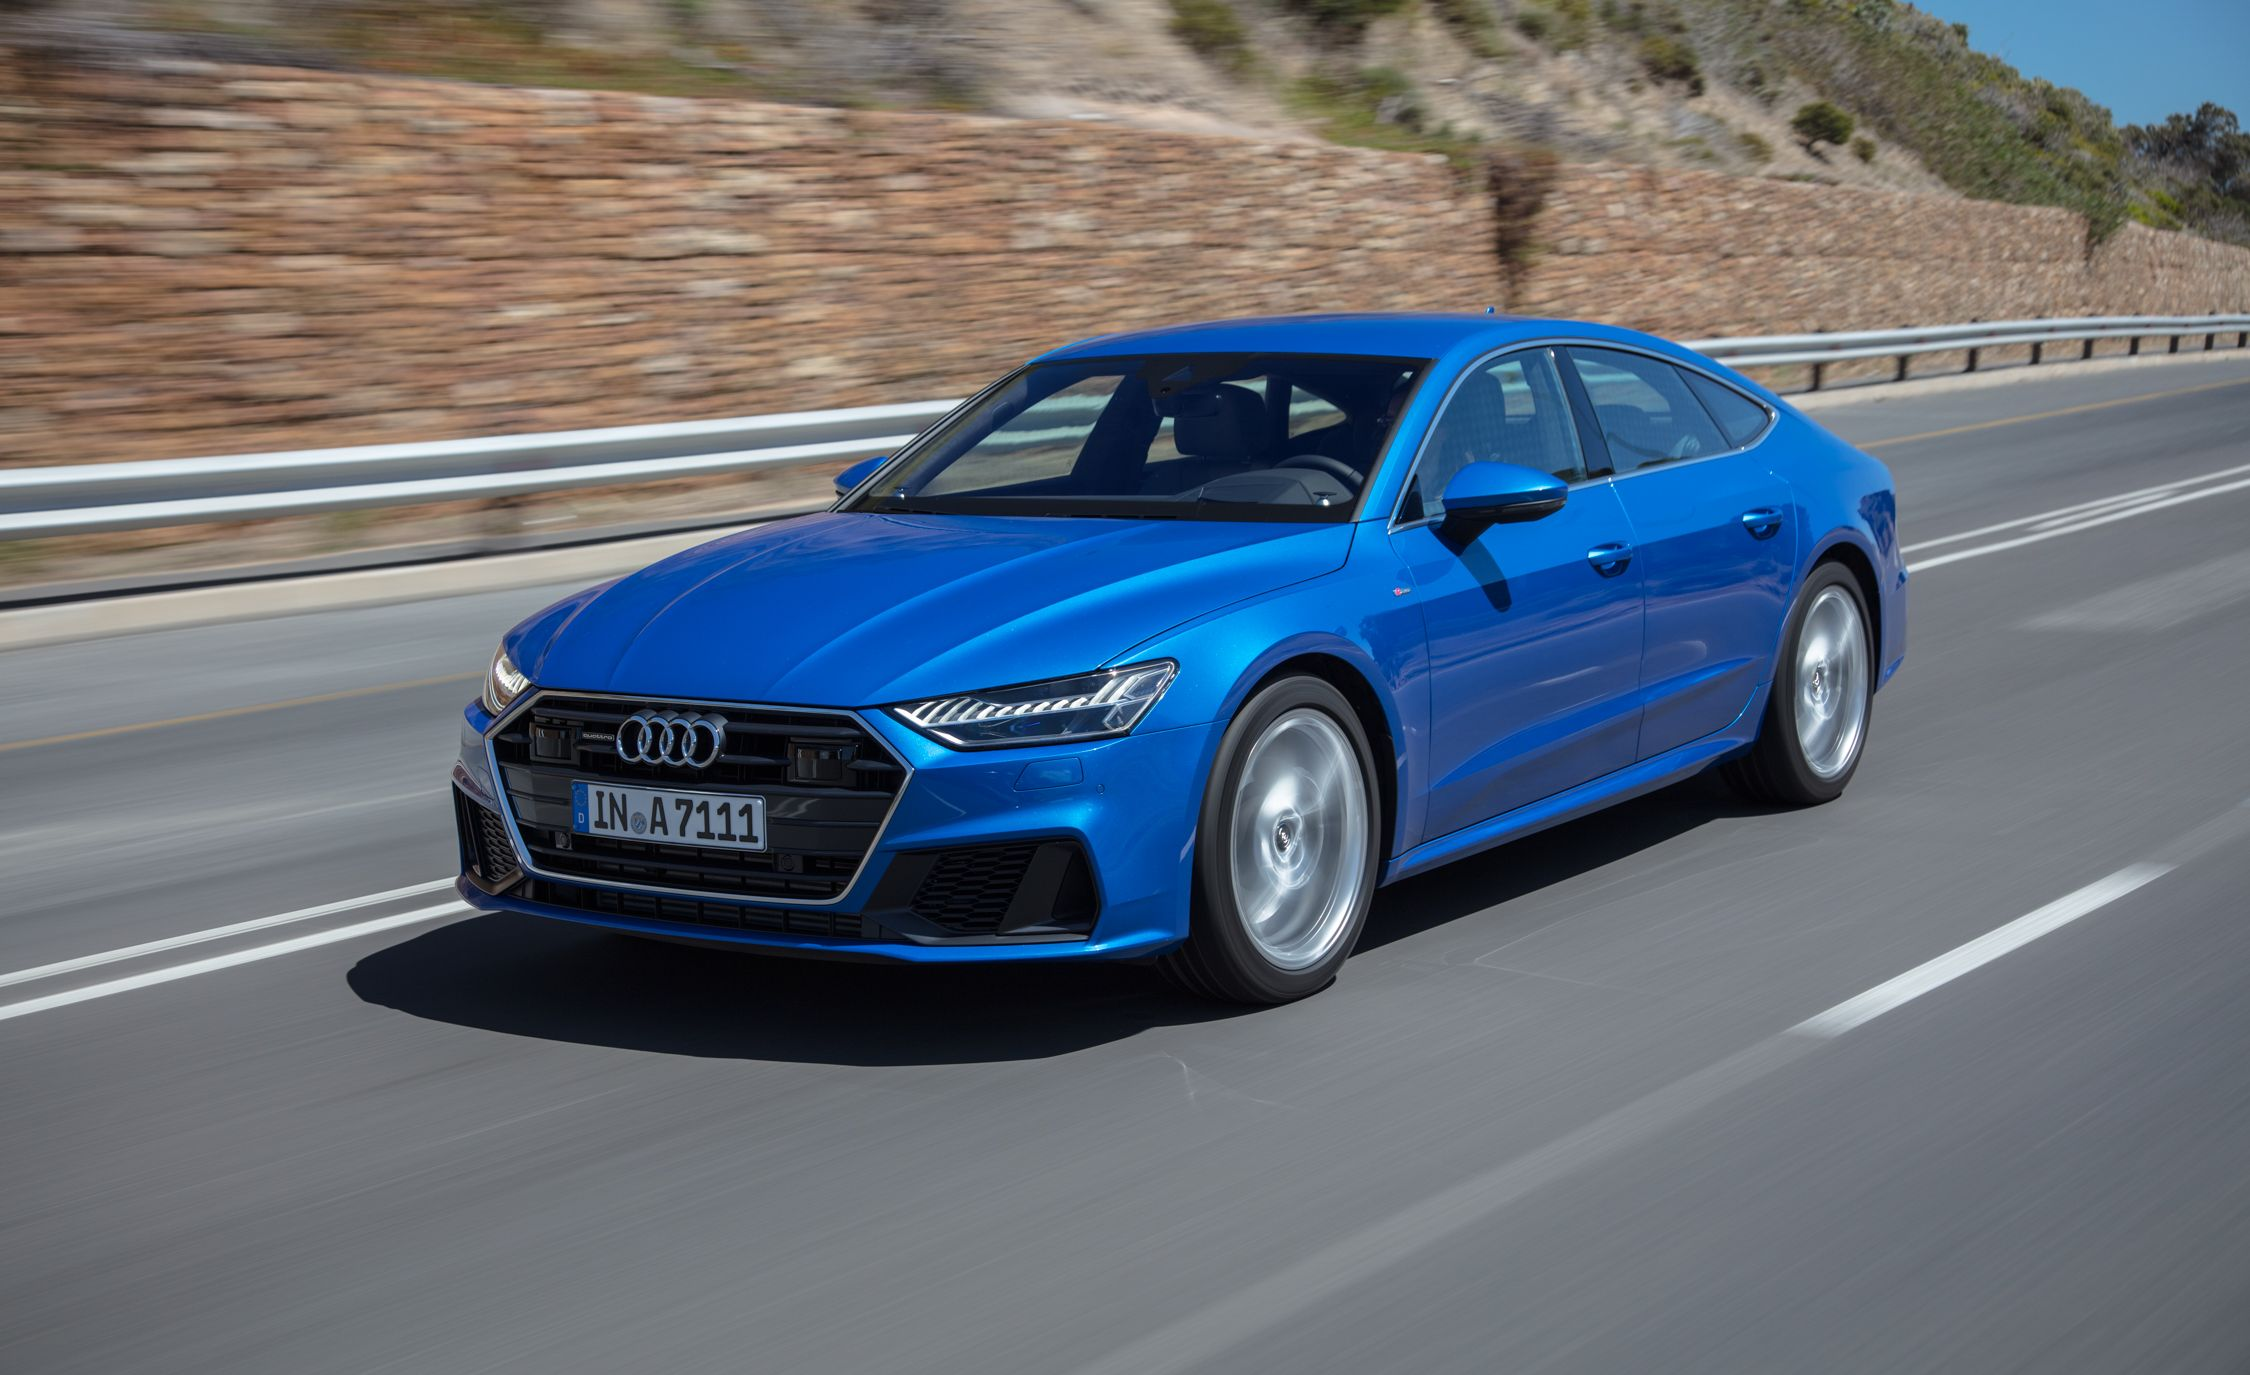 2019-Audi-A7-Sportback-114-1.jpg